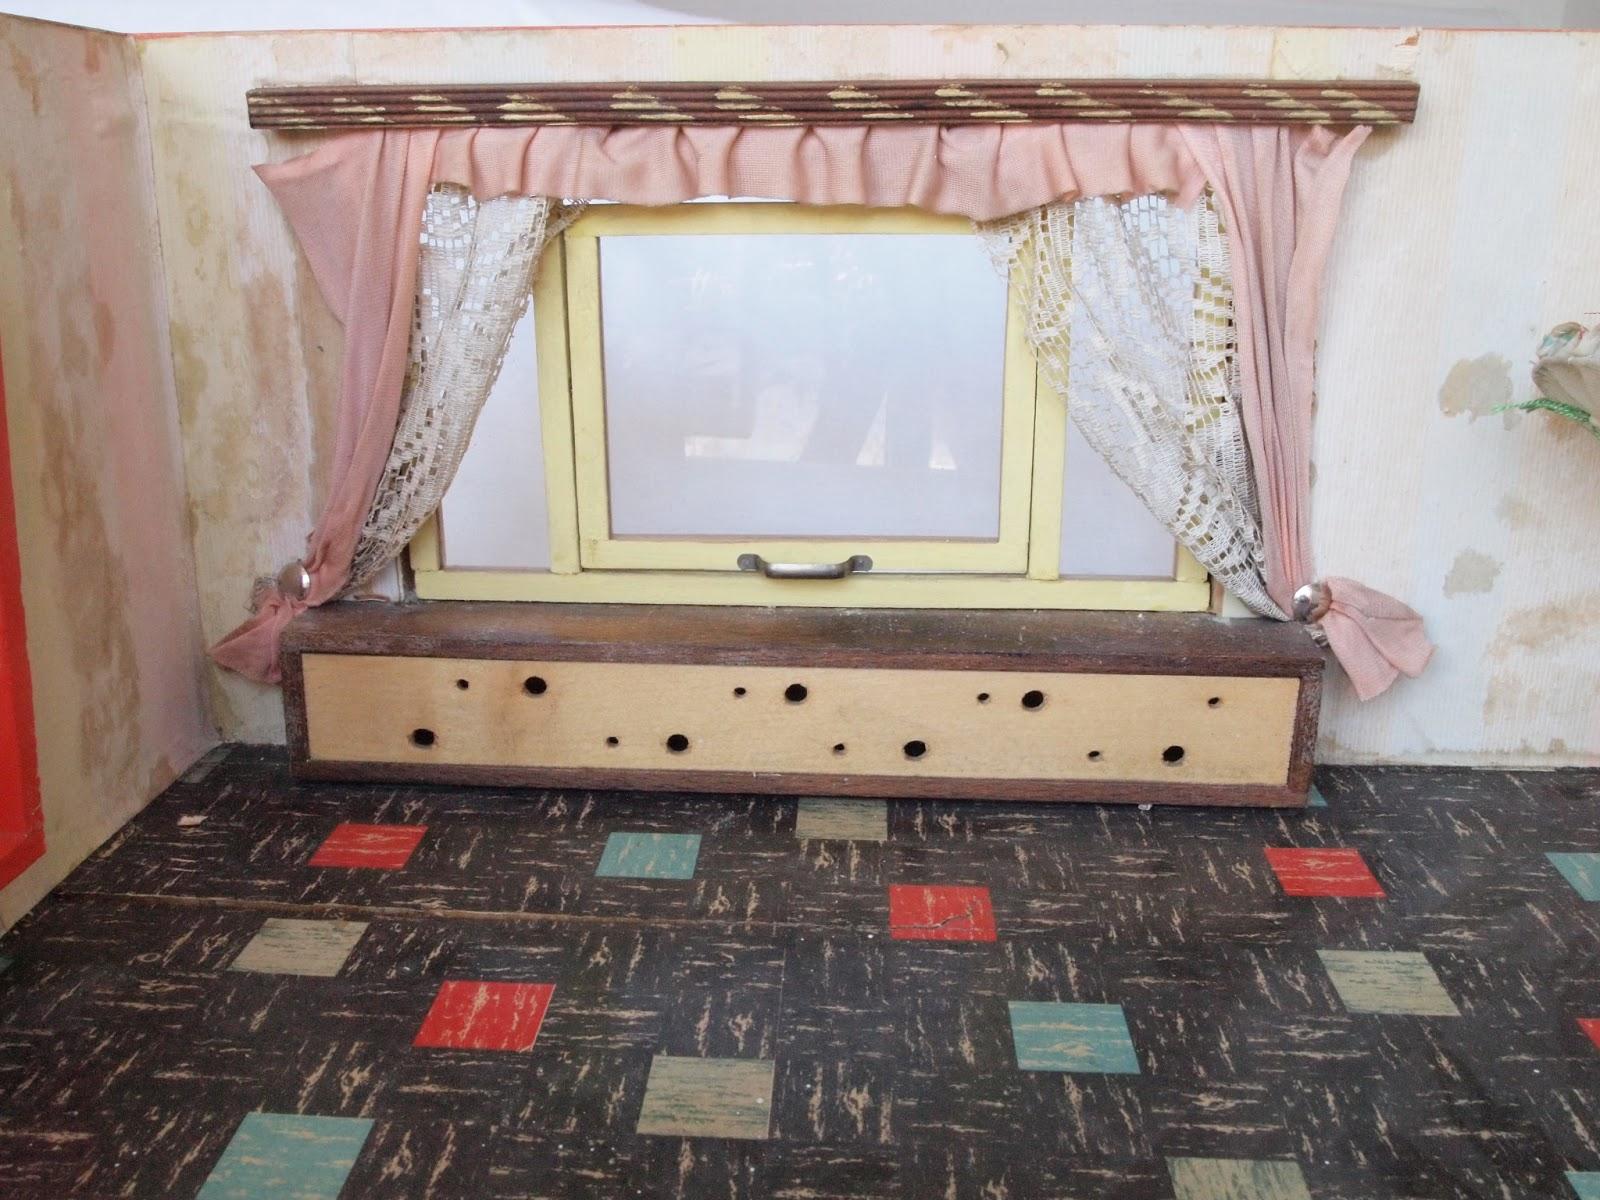 diepuppenstubensammlerin puppenstuben albin sch nherr um 1960 room boxes. Black Bedroom Furniture Sets. Home Design Ideas